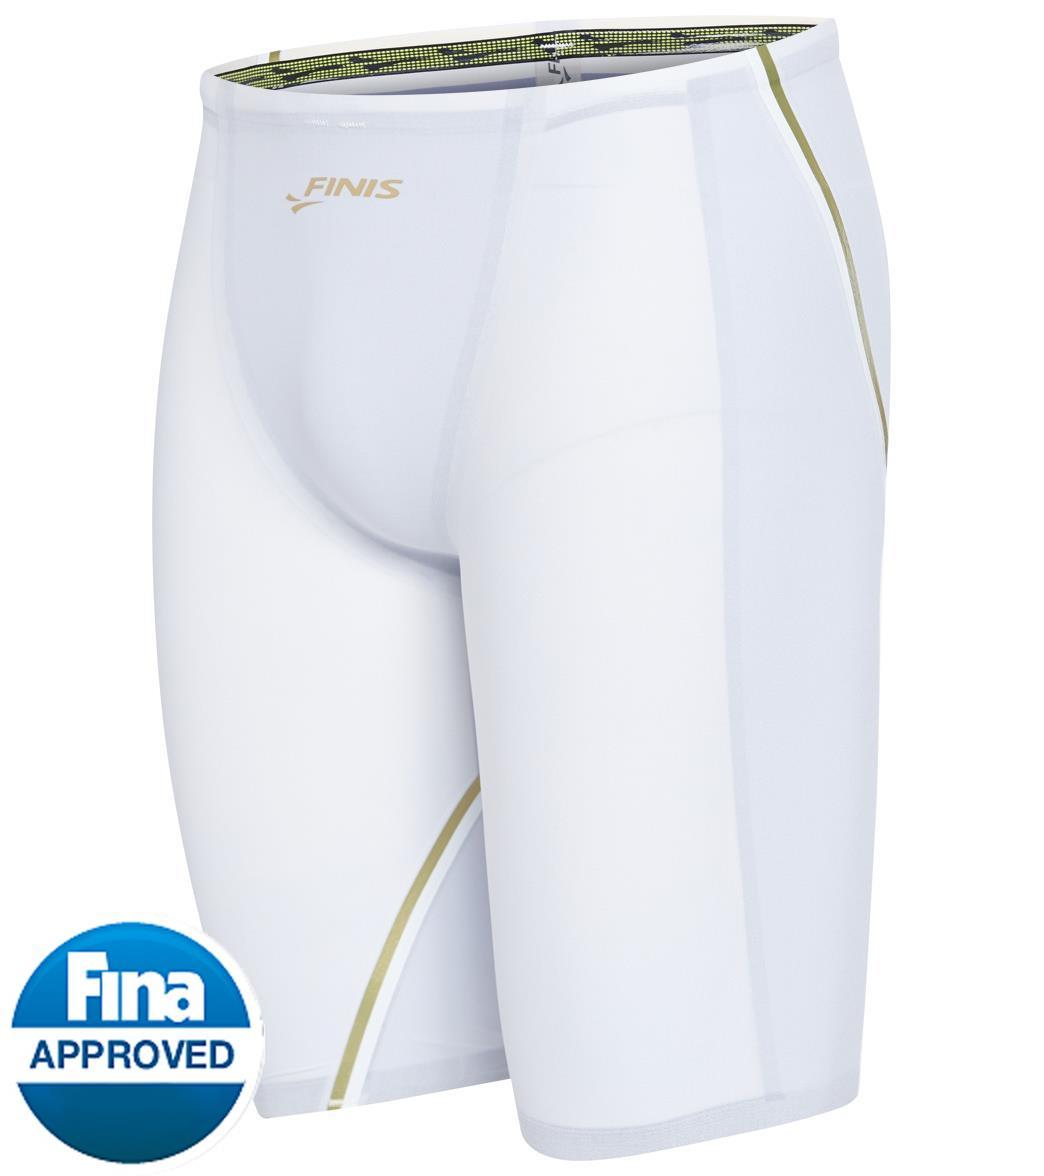 FINIS Men's Rival 2.0 Olivia Jammer Tech Suit Swimsuit